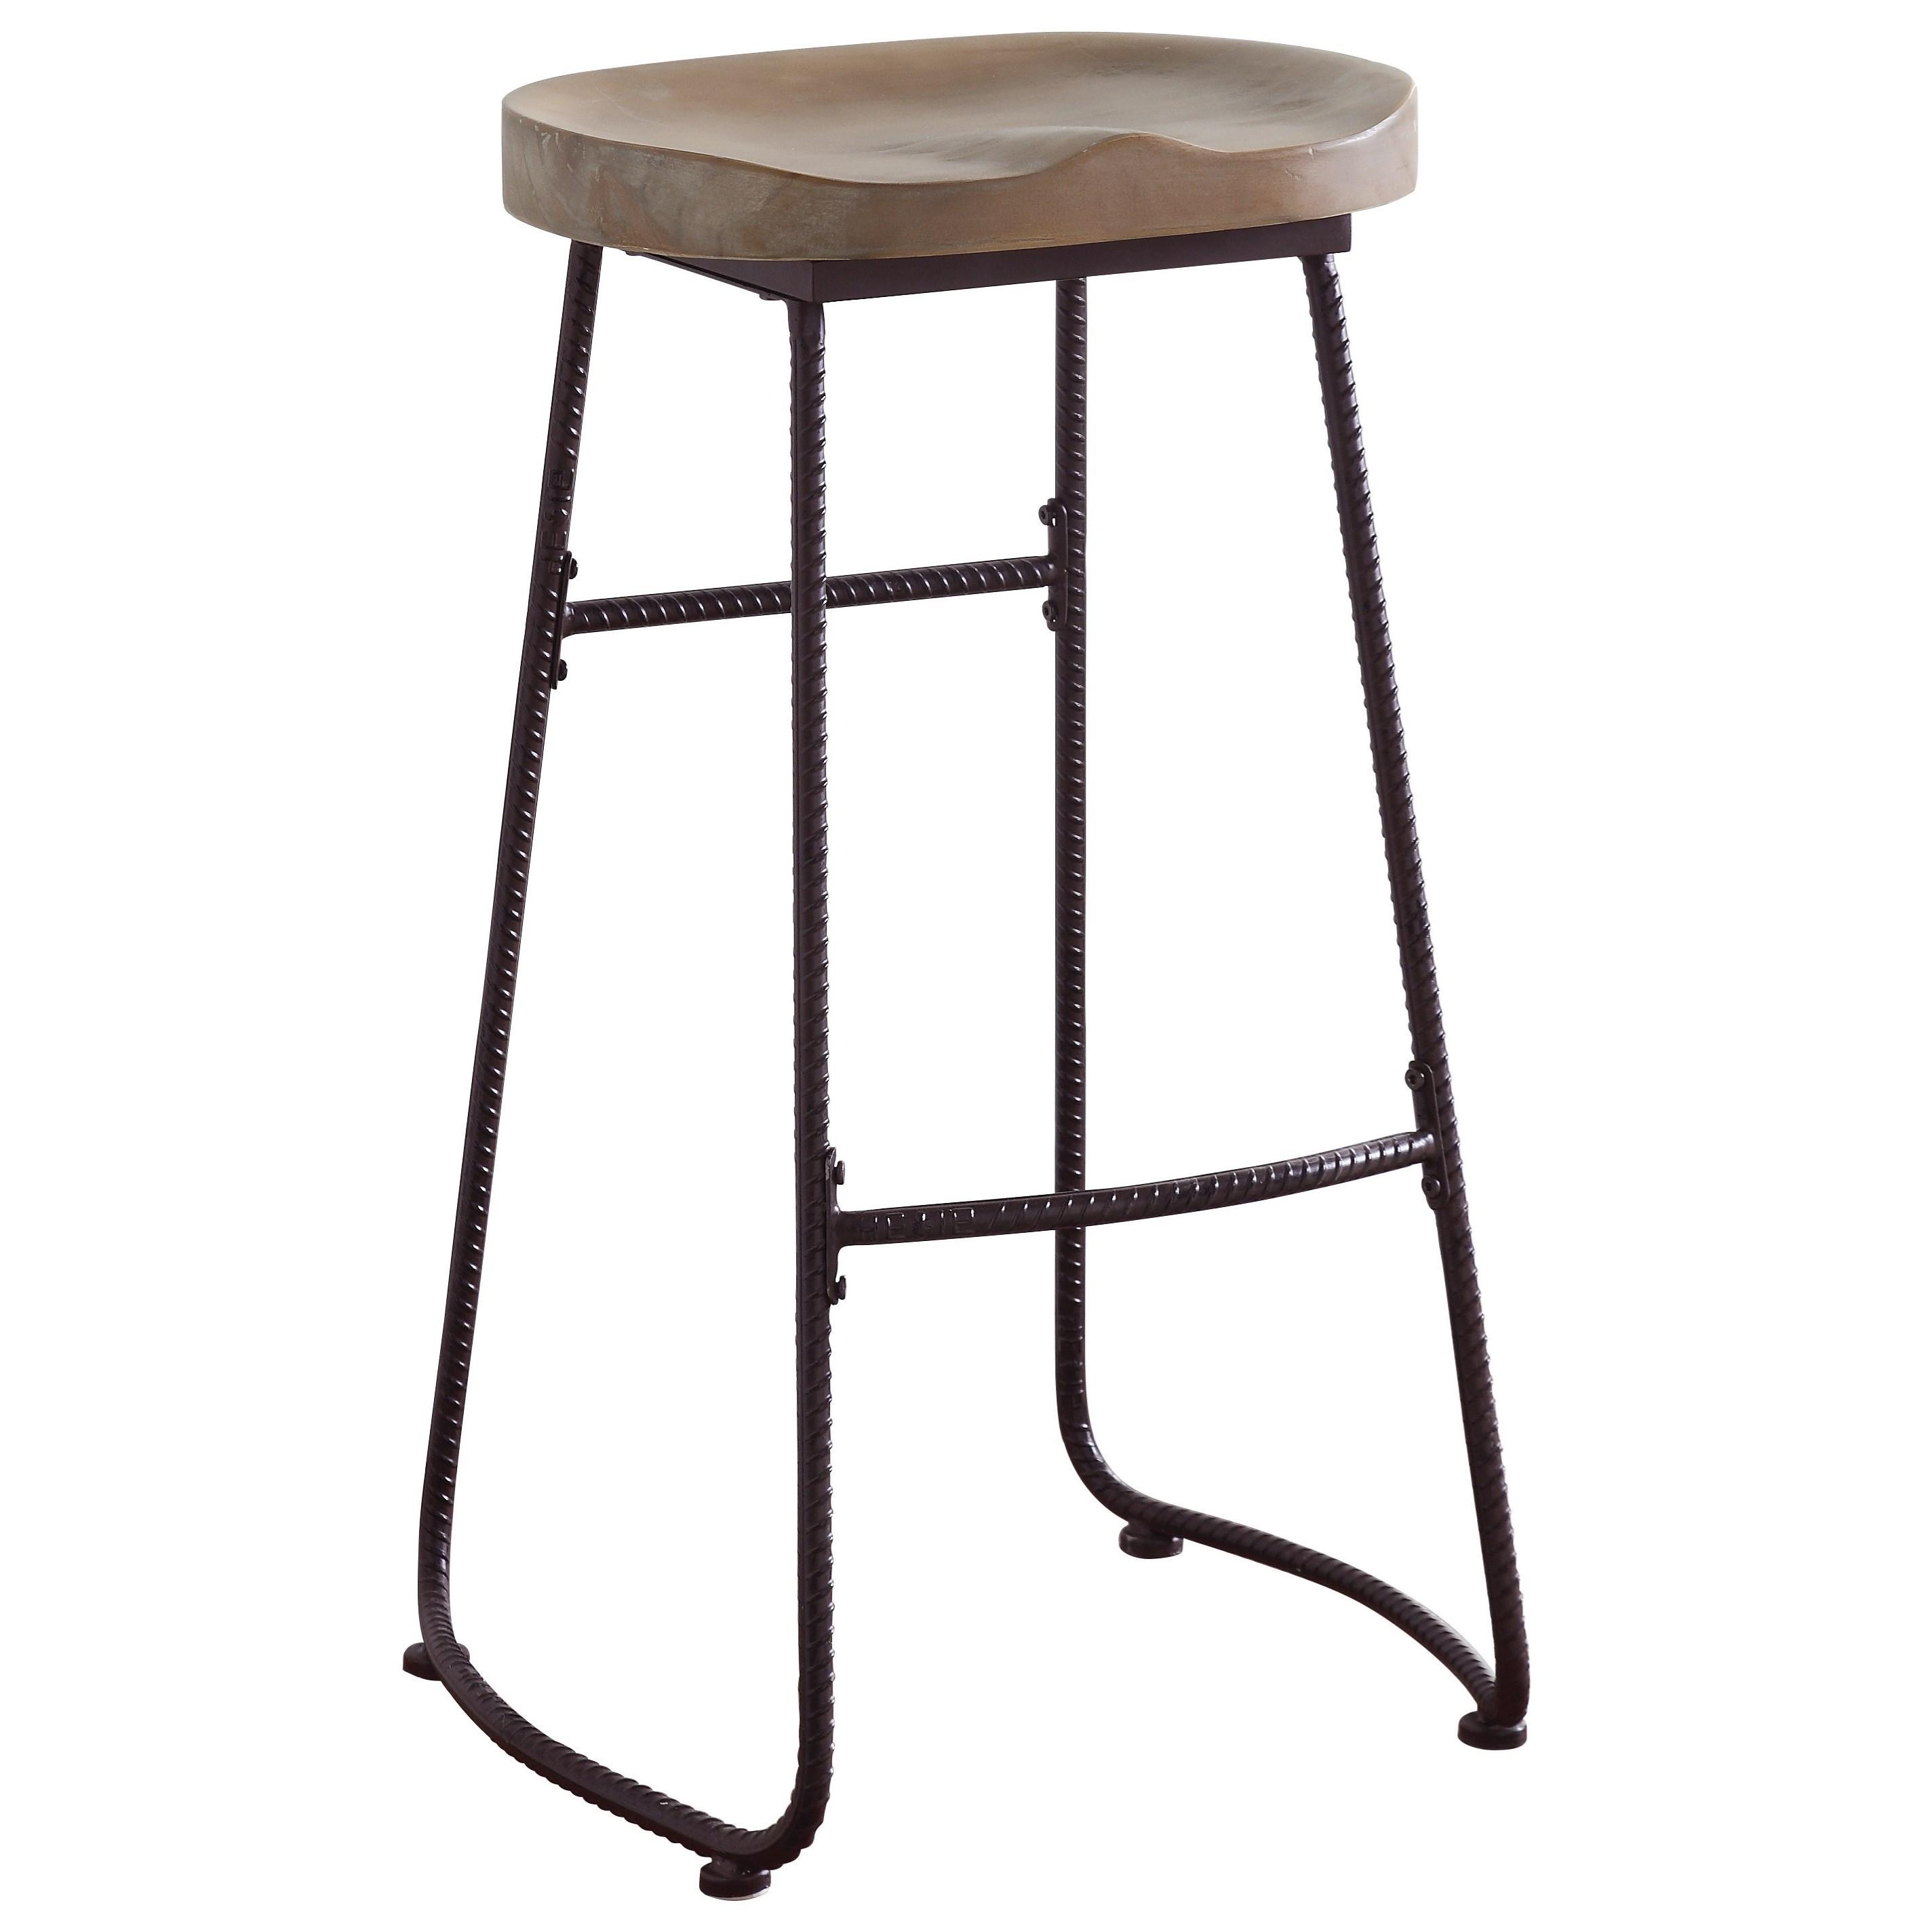 Coaster Dining Chairs And Bar Stools 101086 Rustic Bar